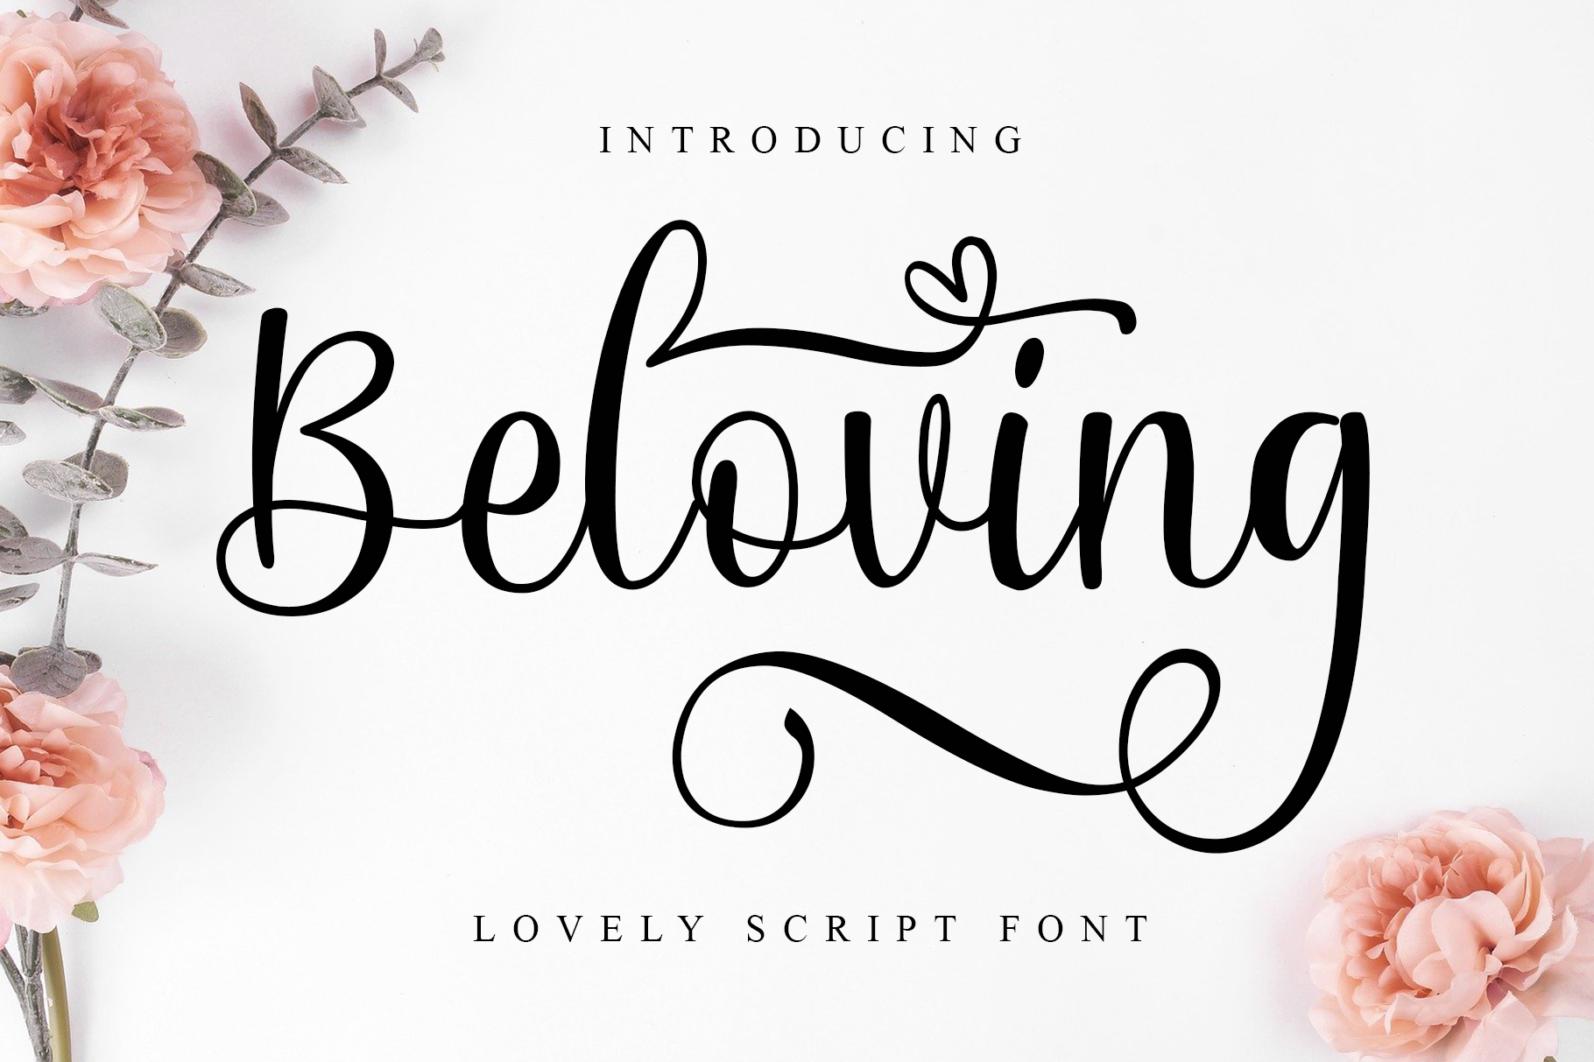 Beautiful Script Font Bundle - 1 91 -